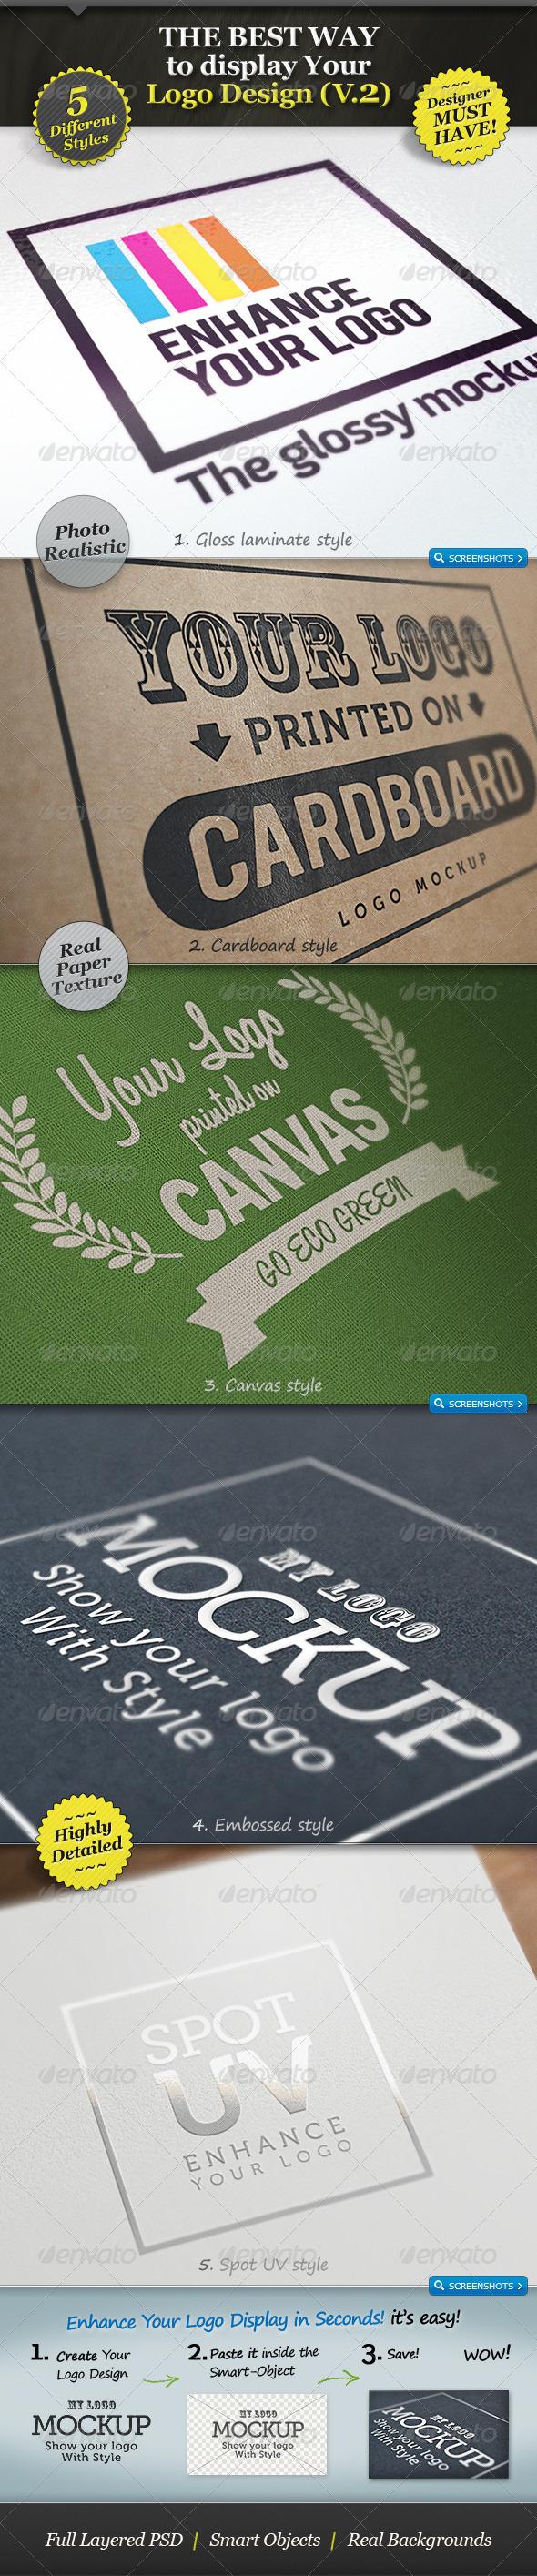 5 Realistic Logo Mockups - Smart Template V.2  - Logo Product Mock-Ups